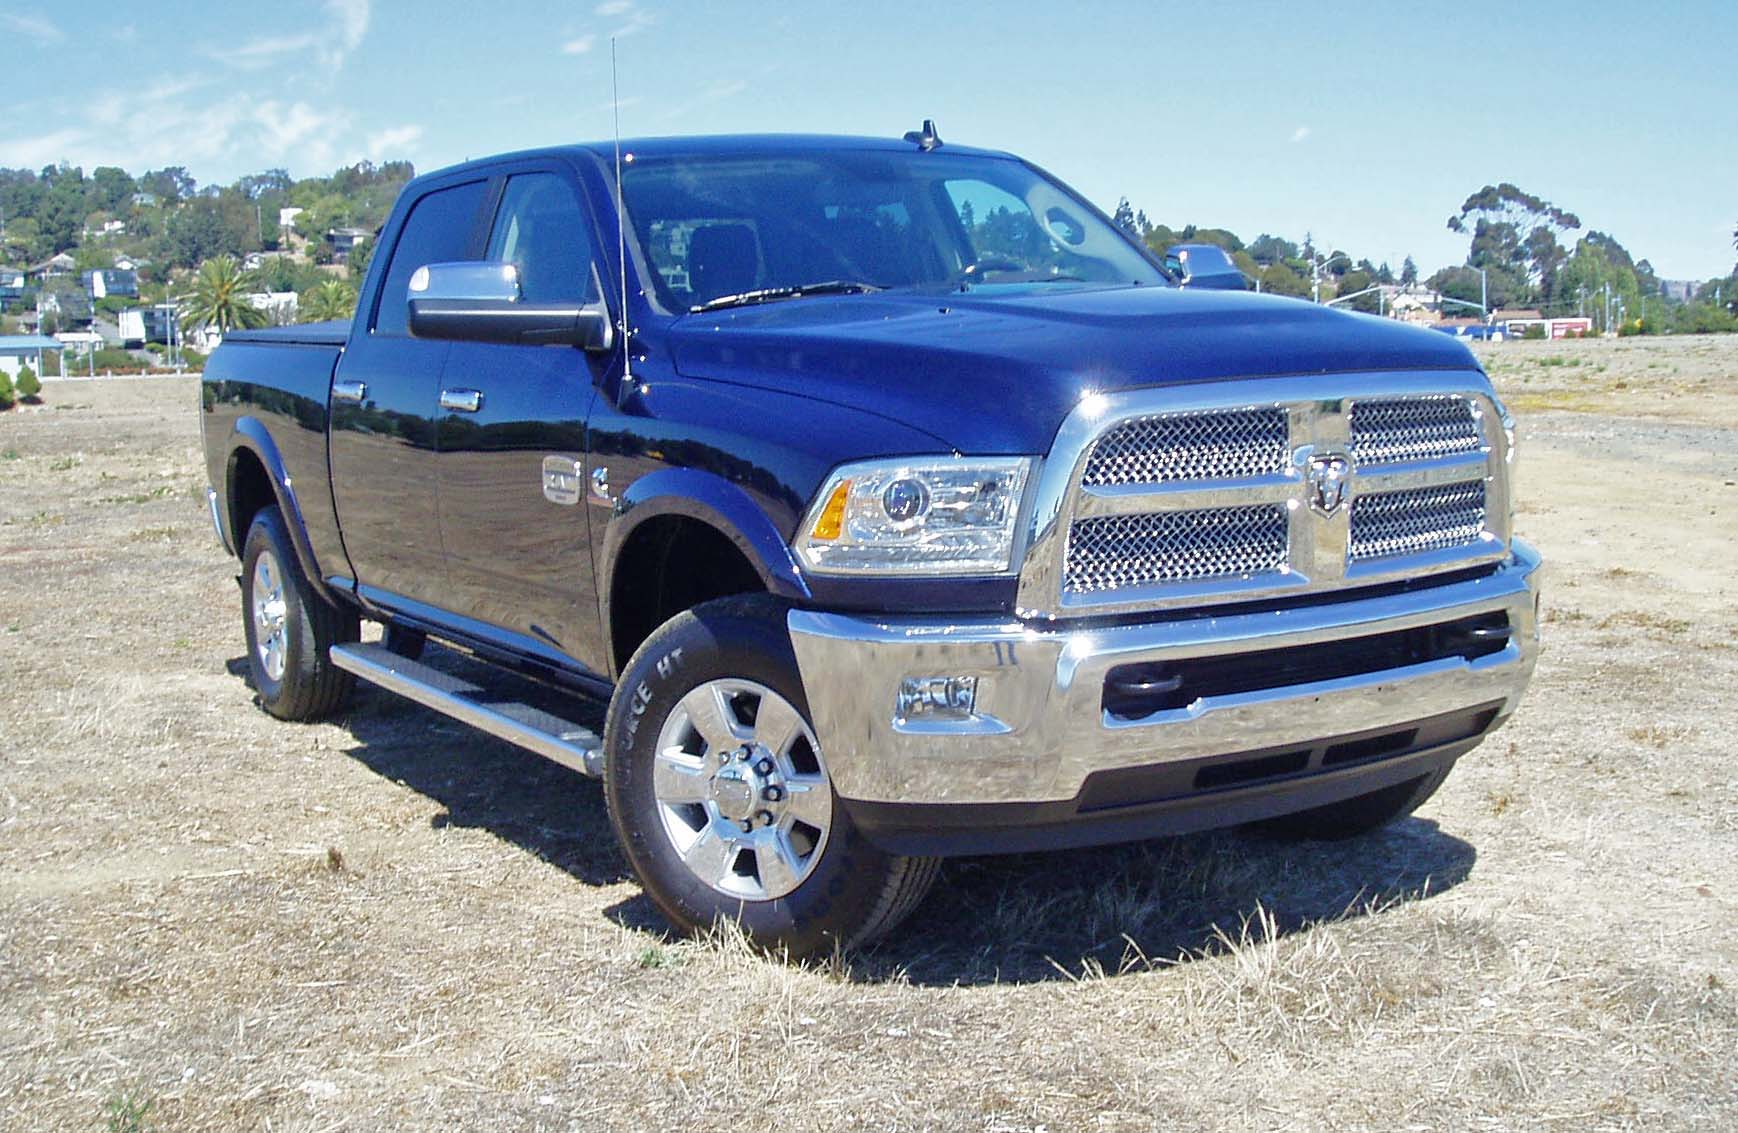 2013 Ram 3500 Laramie Longhorn Crew Cab 4 215 4 Test Drive